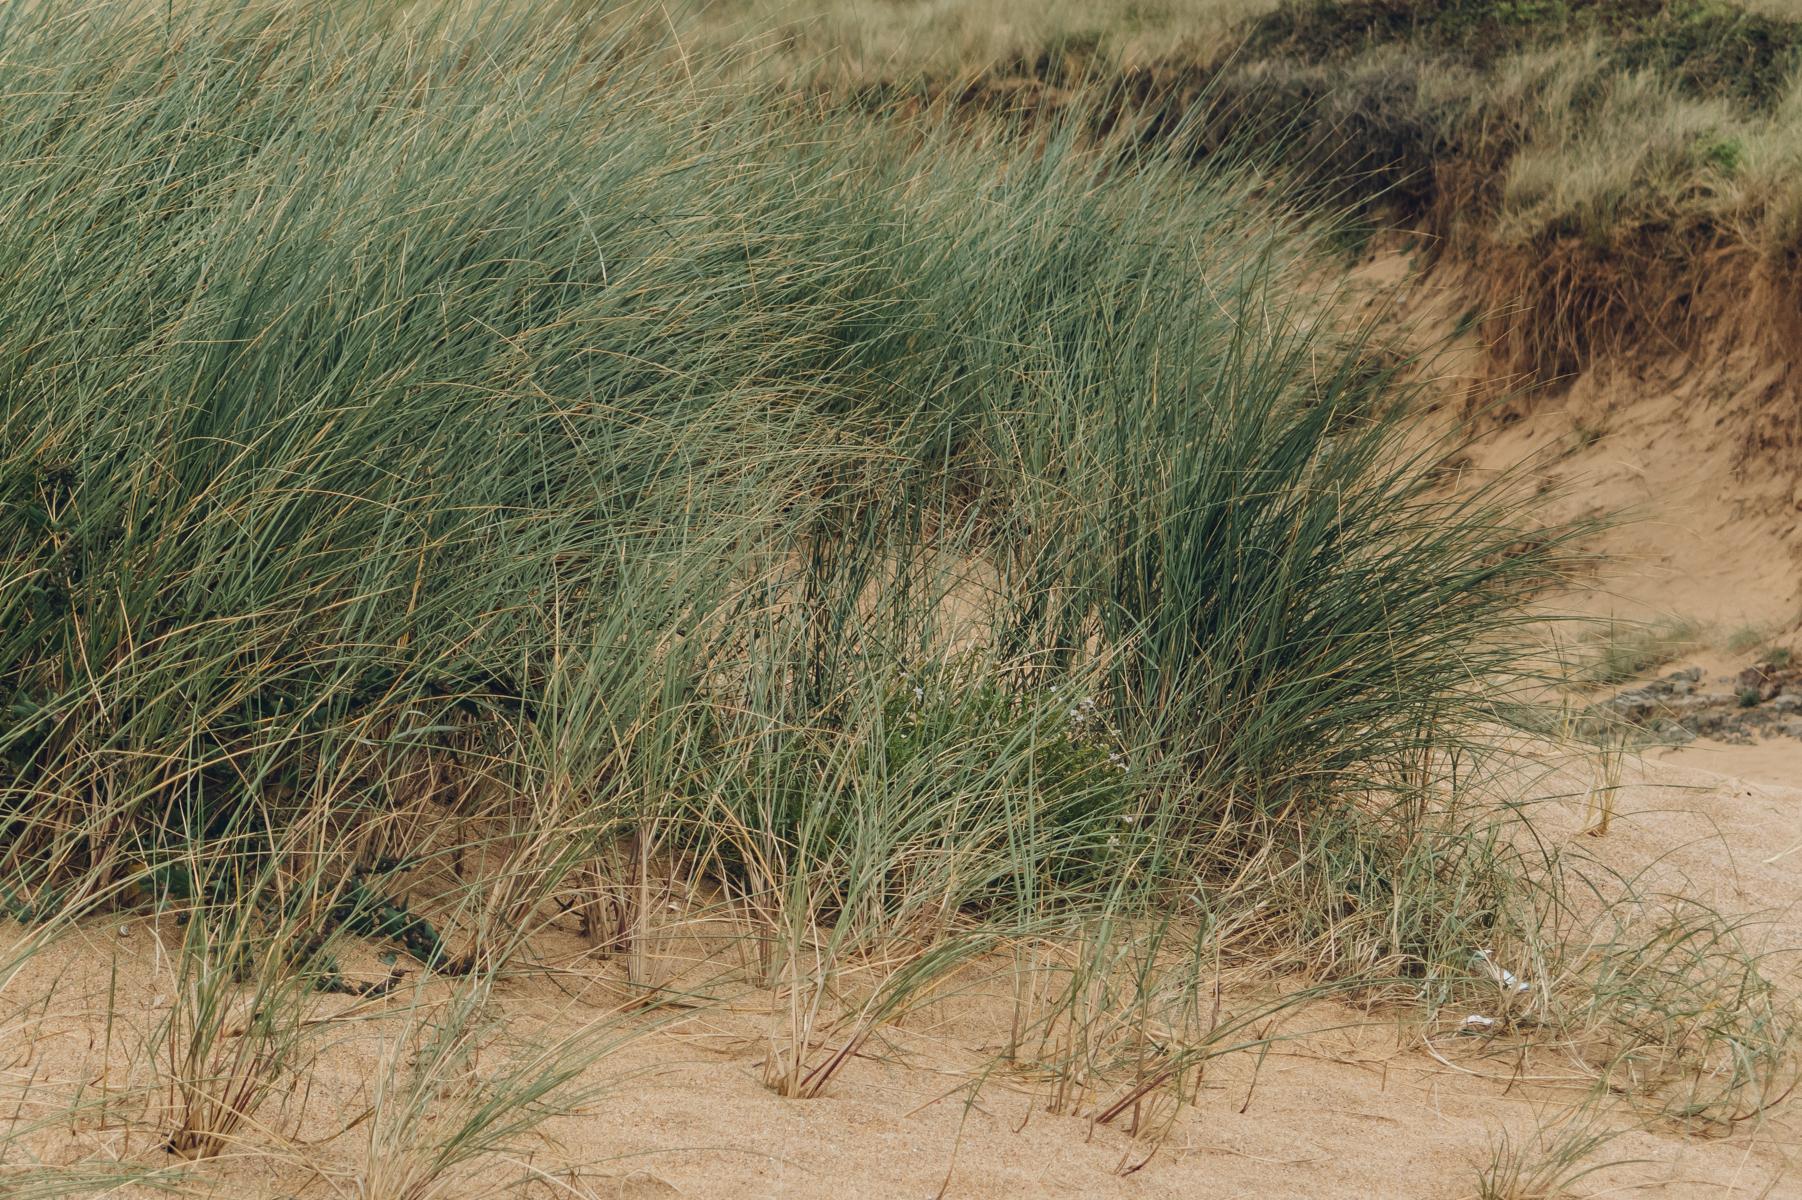 Grassy sand dunes.